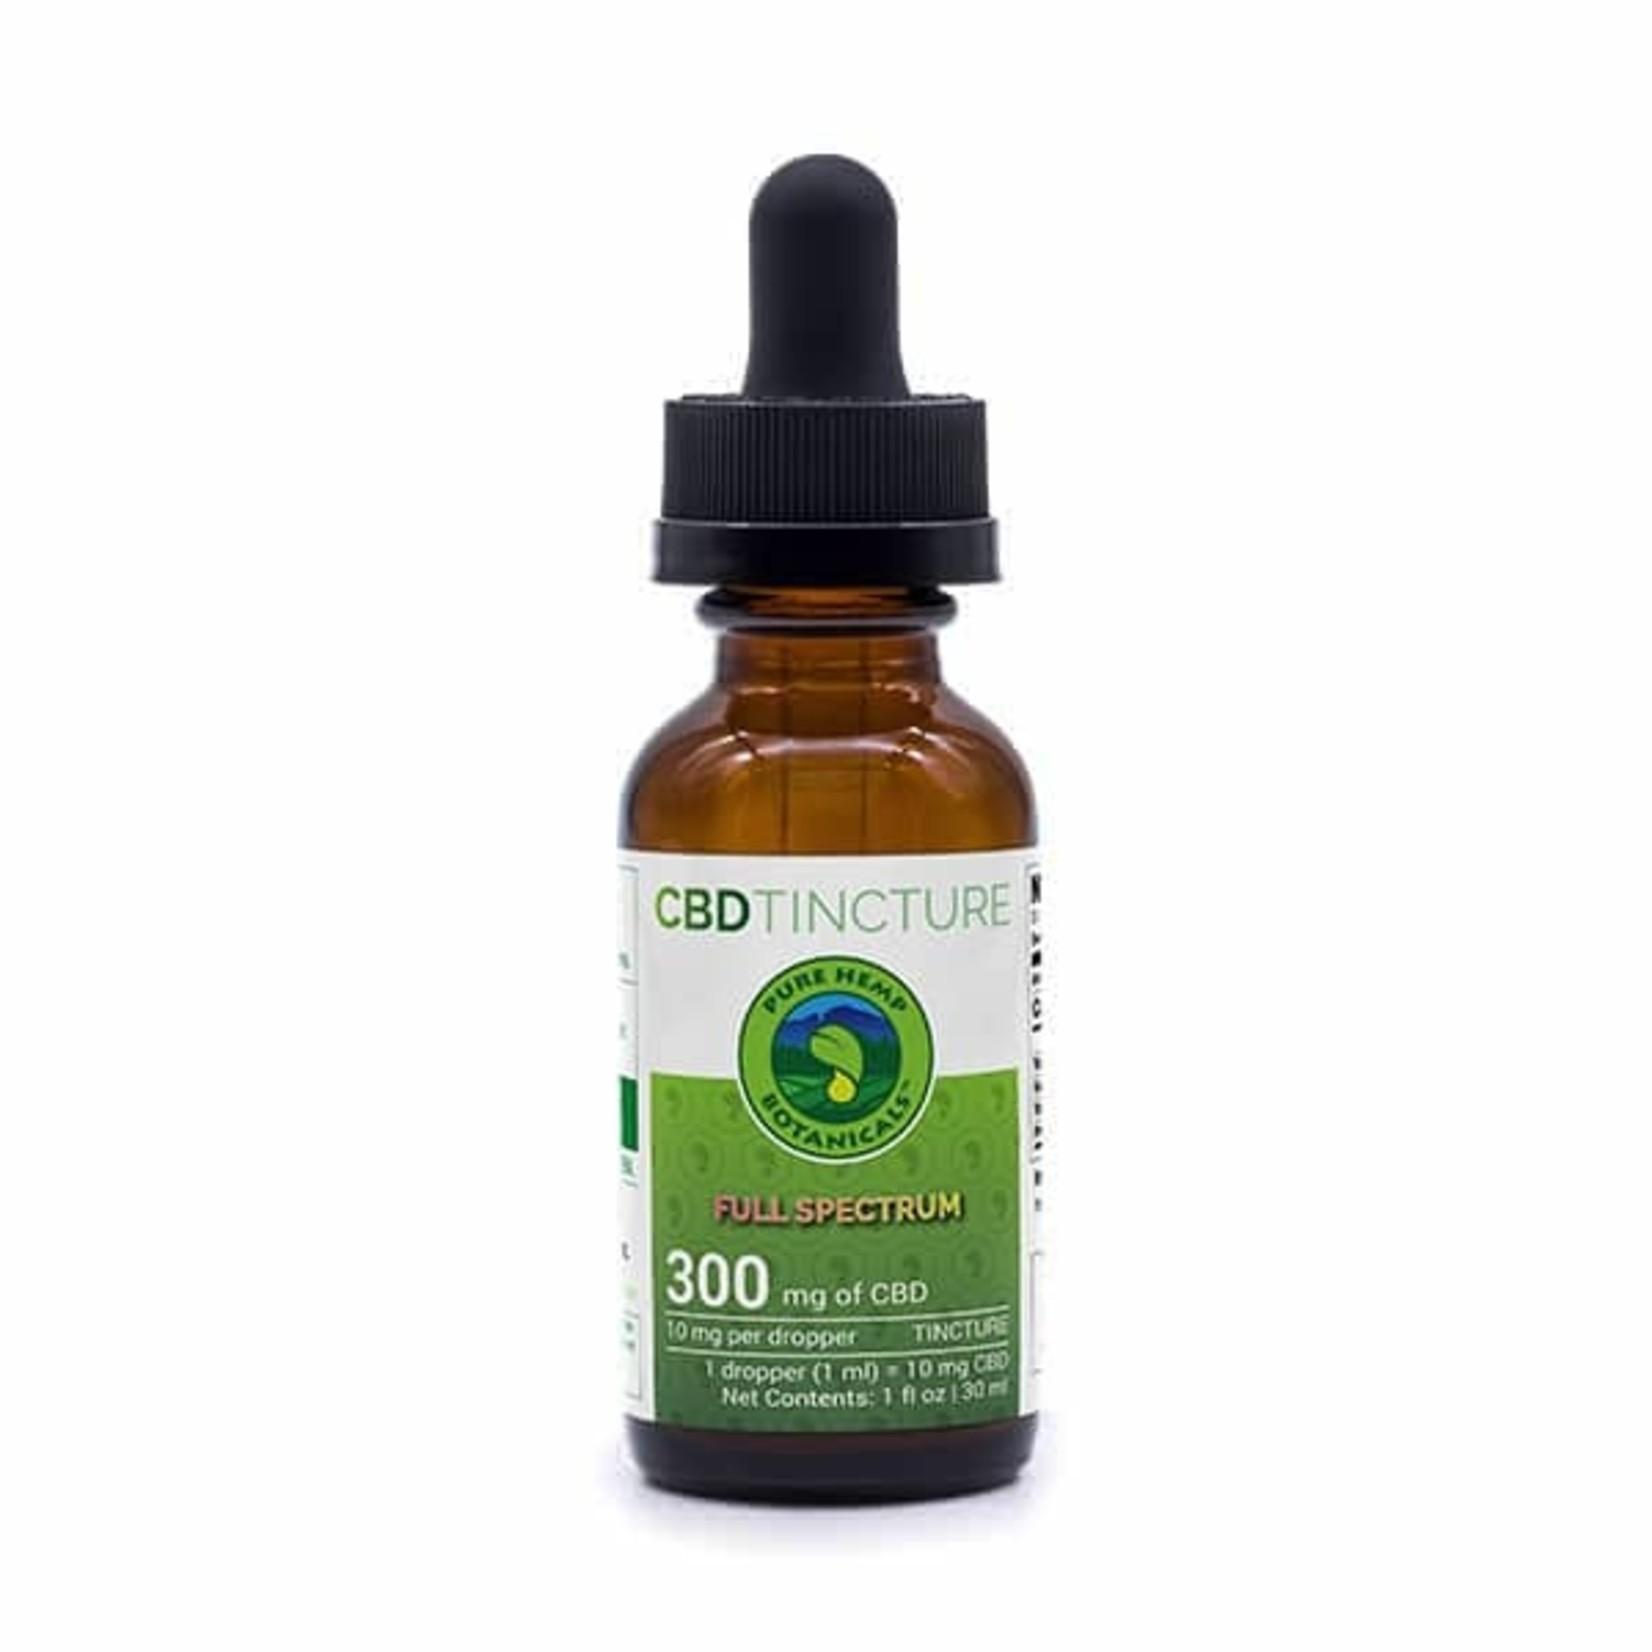 Pure Hemp Botanicals PHB Full Spectrum CBD Tincture Oil 300mg 30ml